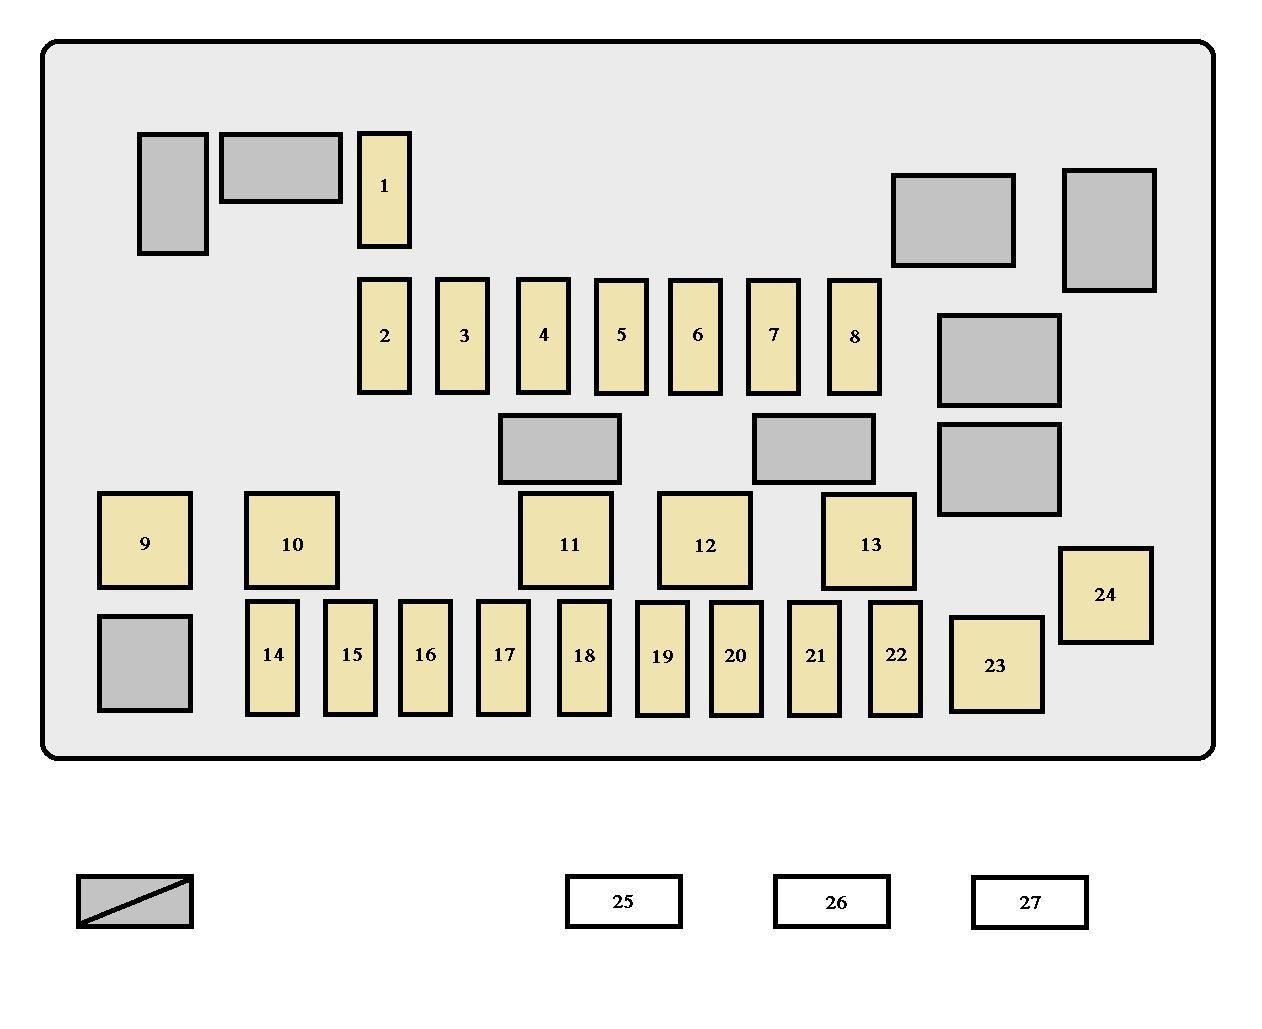 2005 Scion Xa Fuse Box Diagram Schema Wiring Diagrams 2009 Chevy Aveo Tc 2006 Blogs Xb